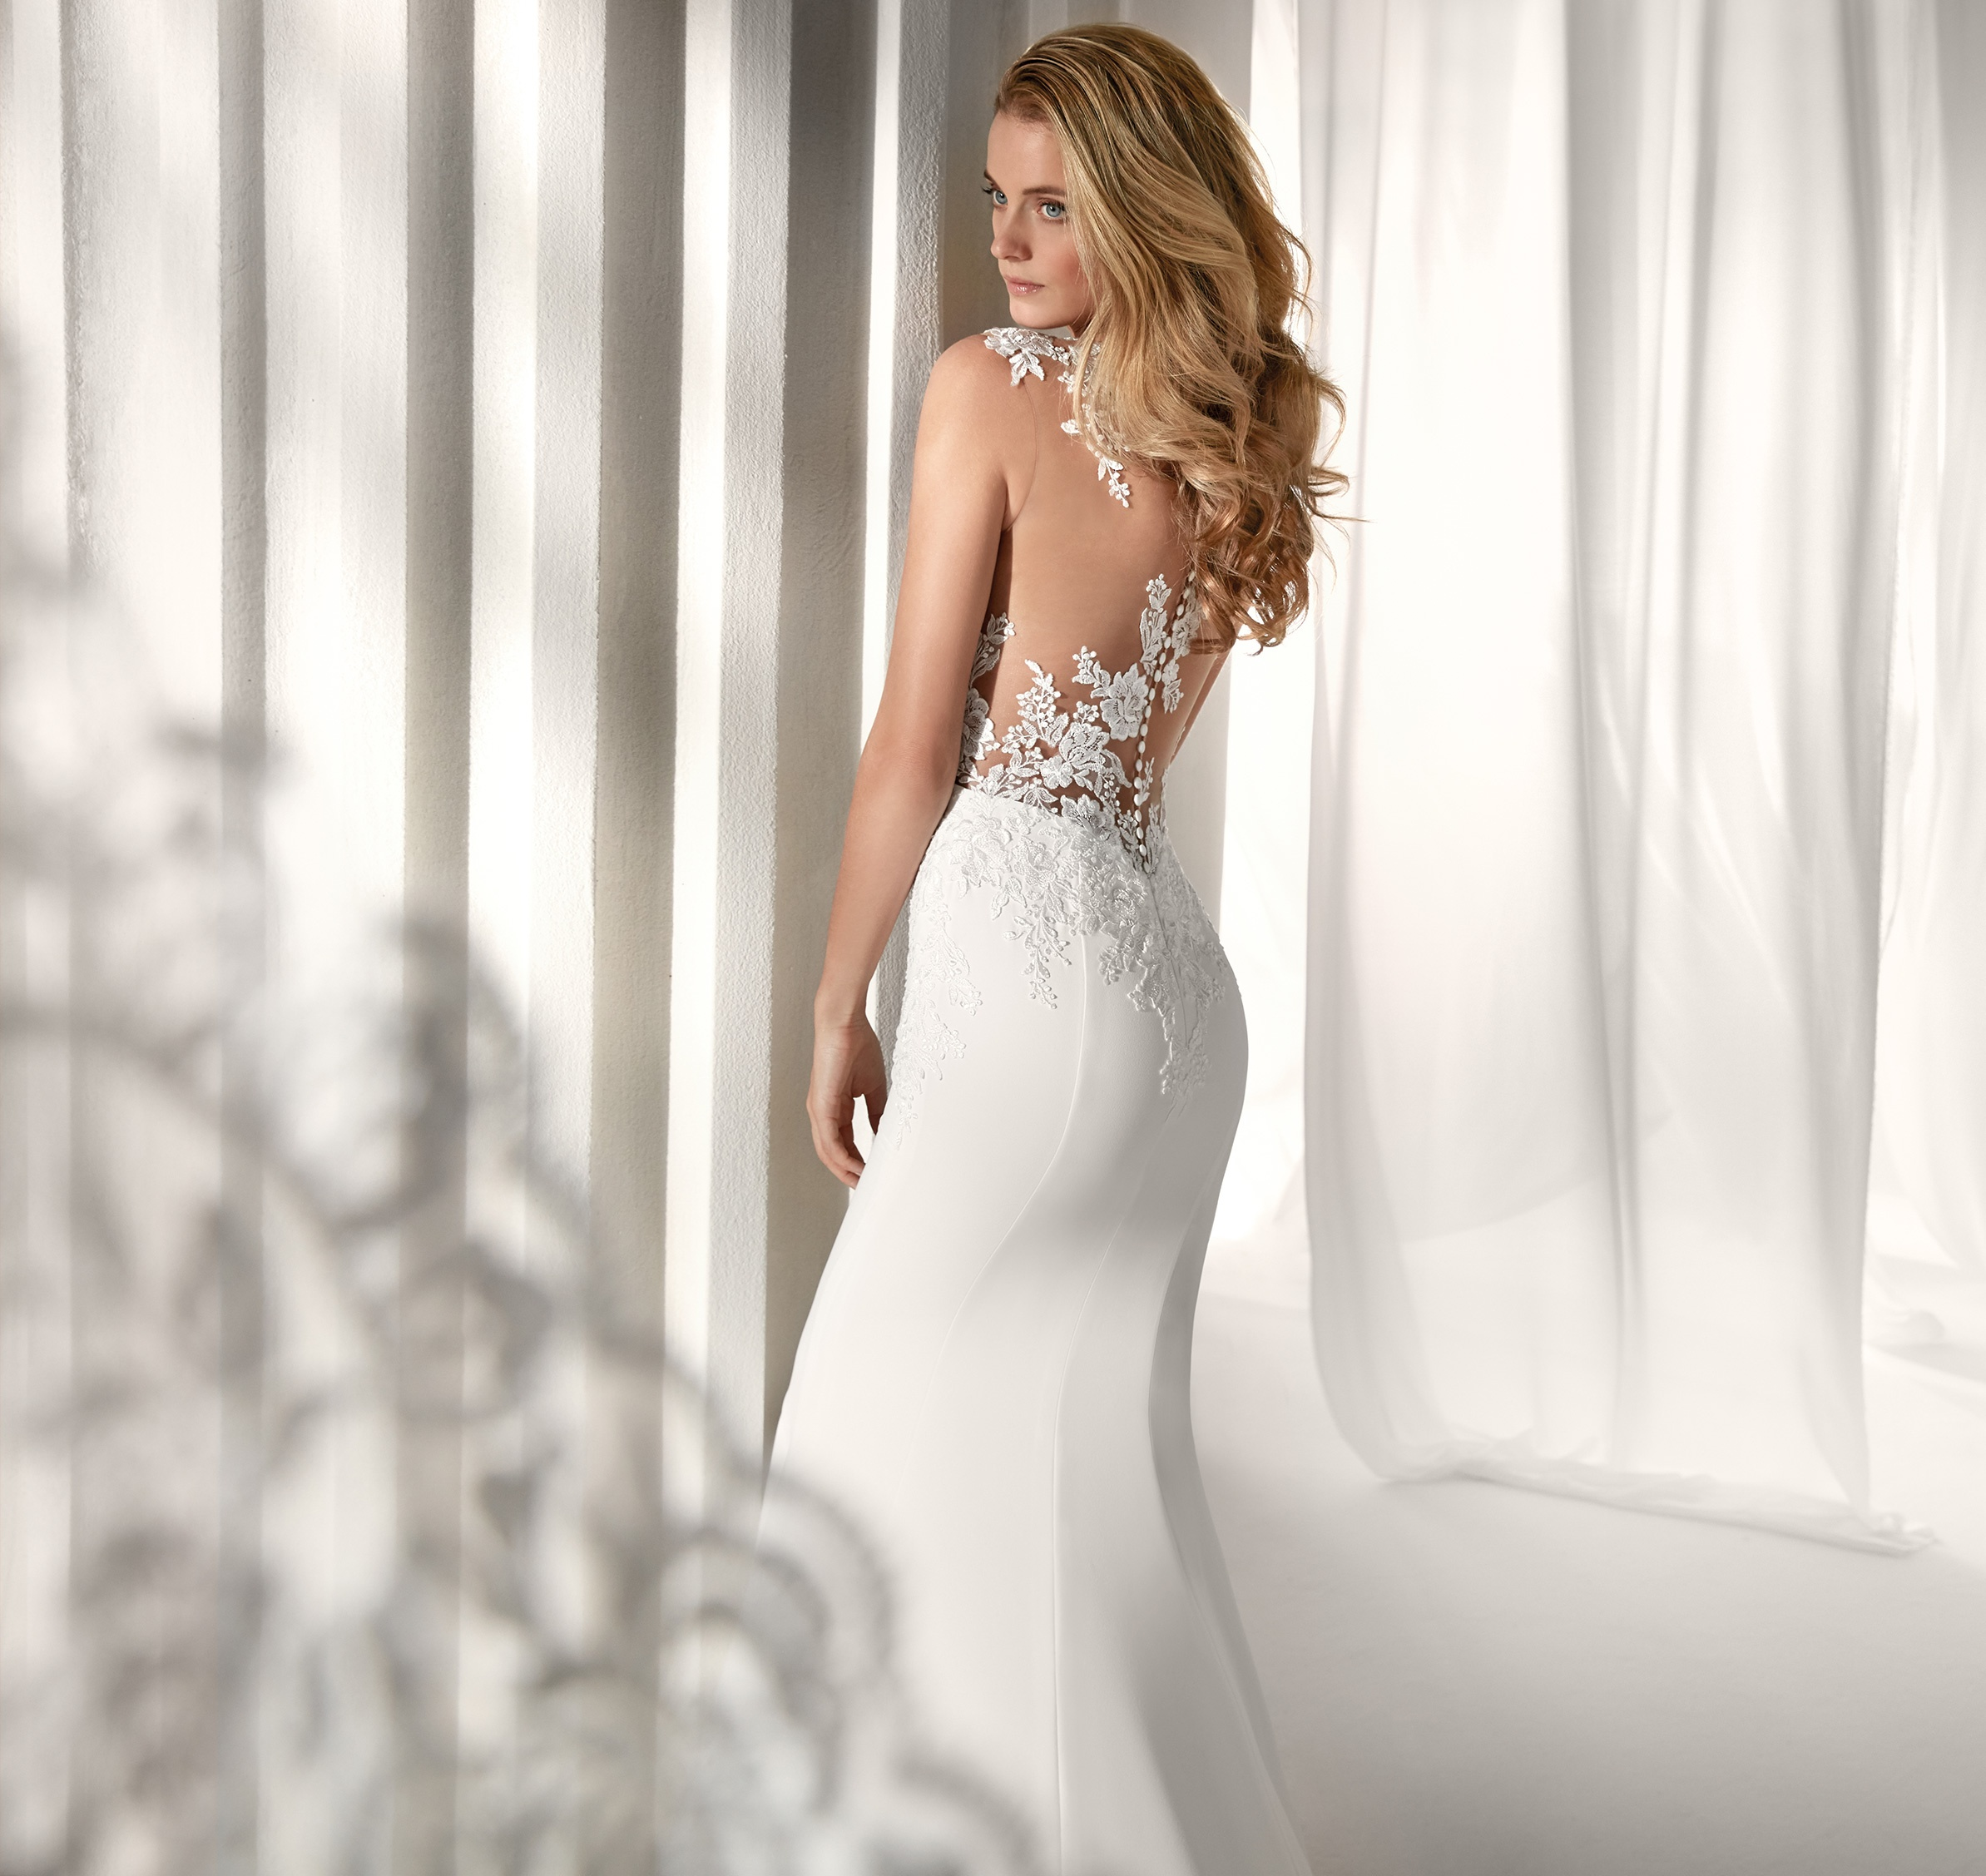 nicole-spose-NIAB19143-Nicole-moda-sposa-2019-466.jpg